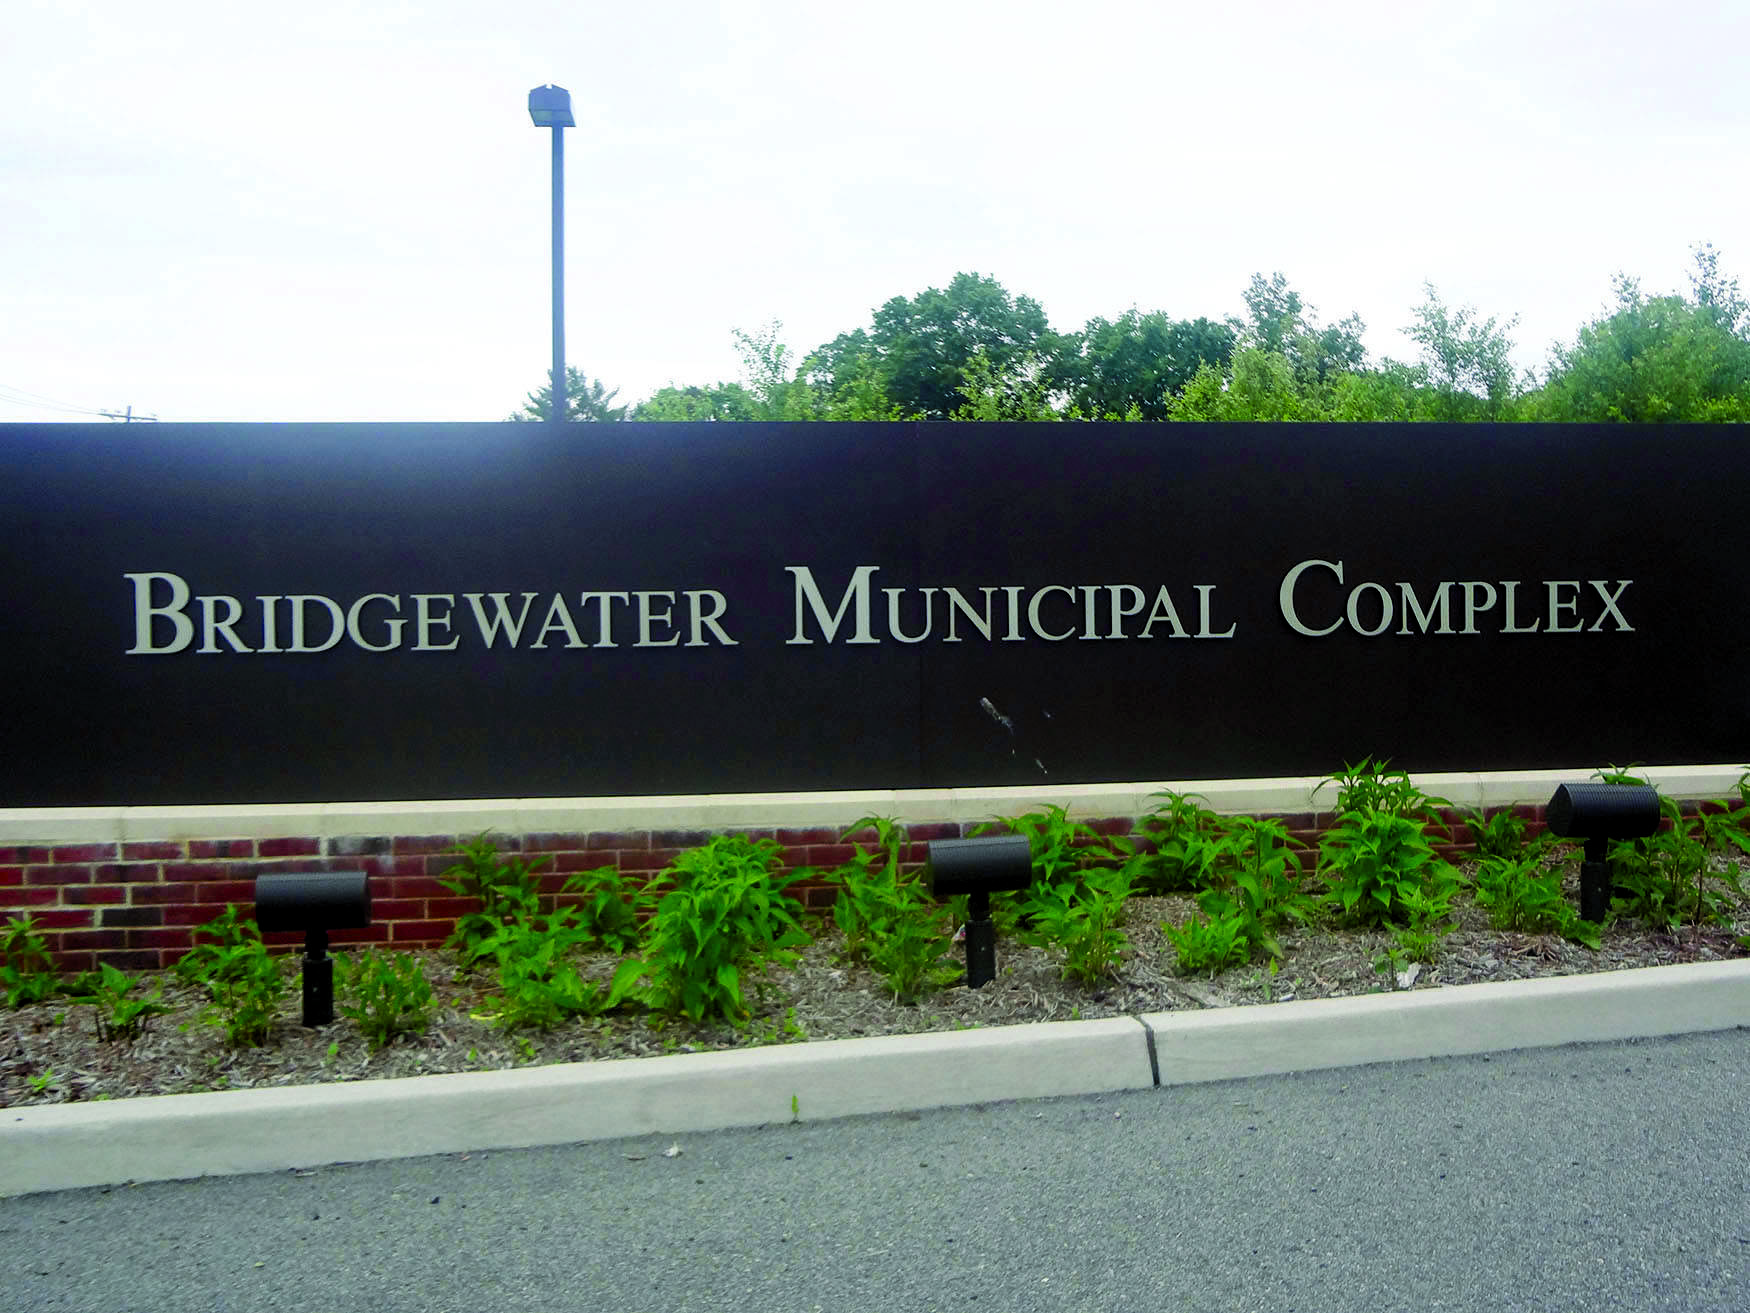 1bf108bb741a66d0a2f5_Bridgewater_municipal.jpg